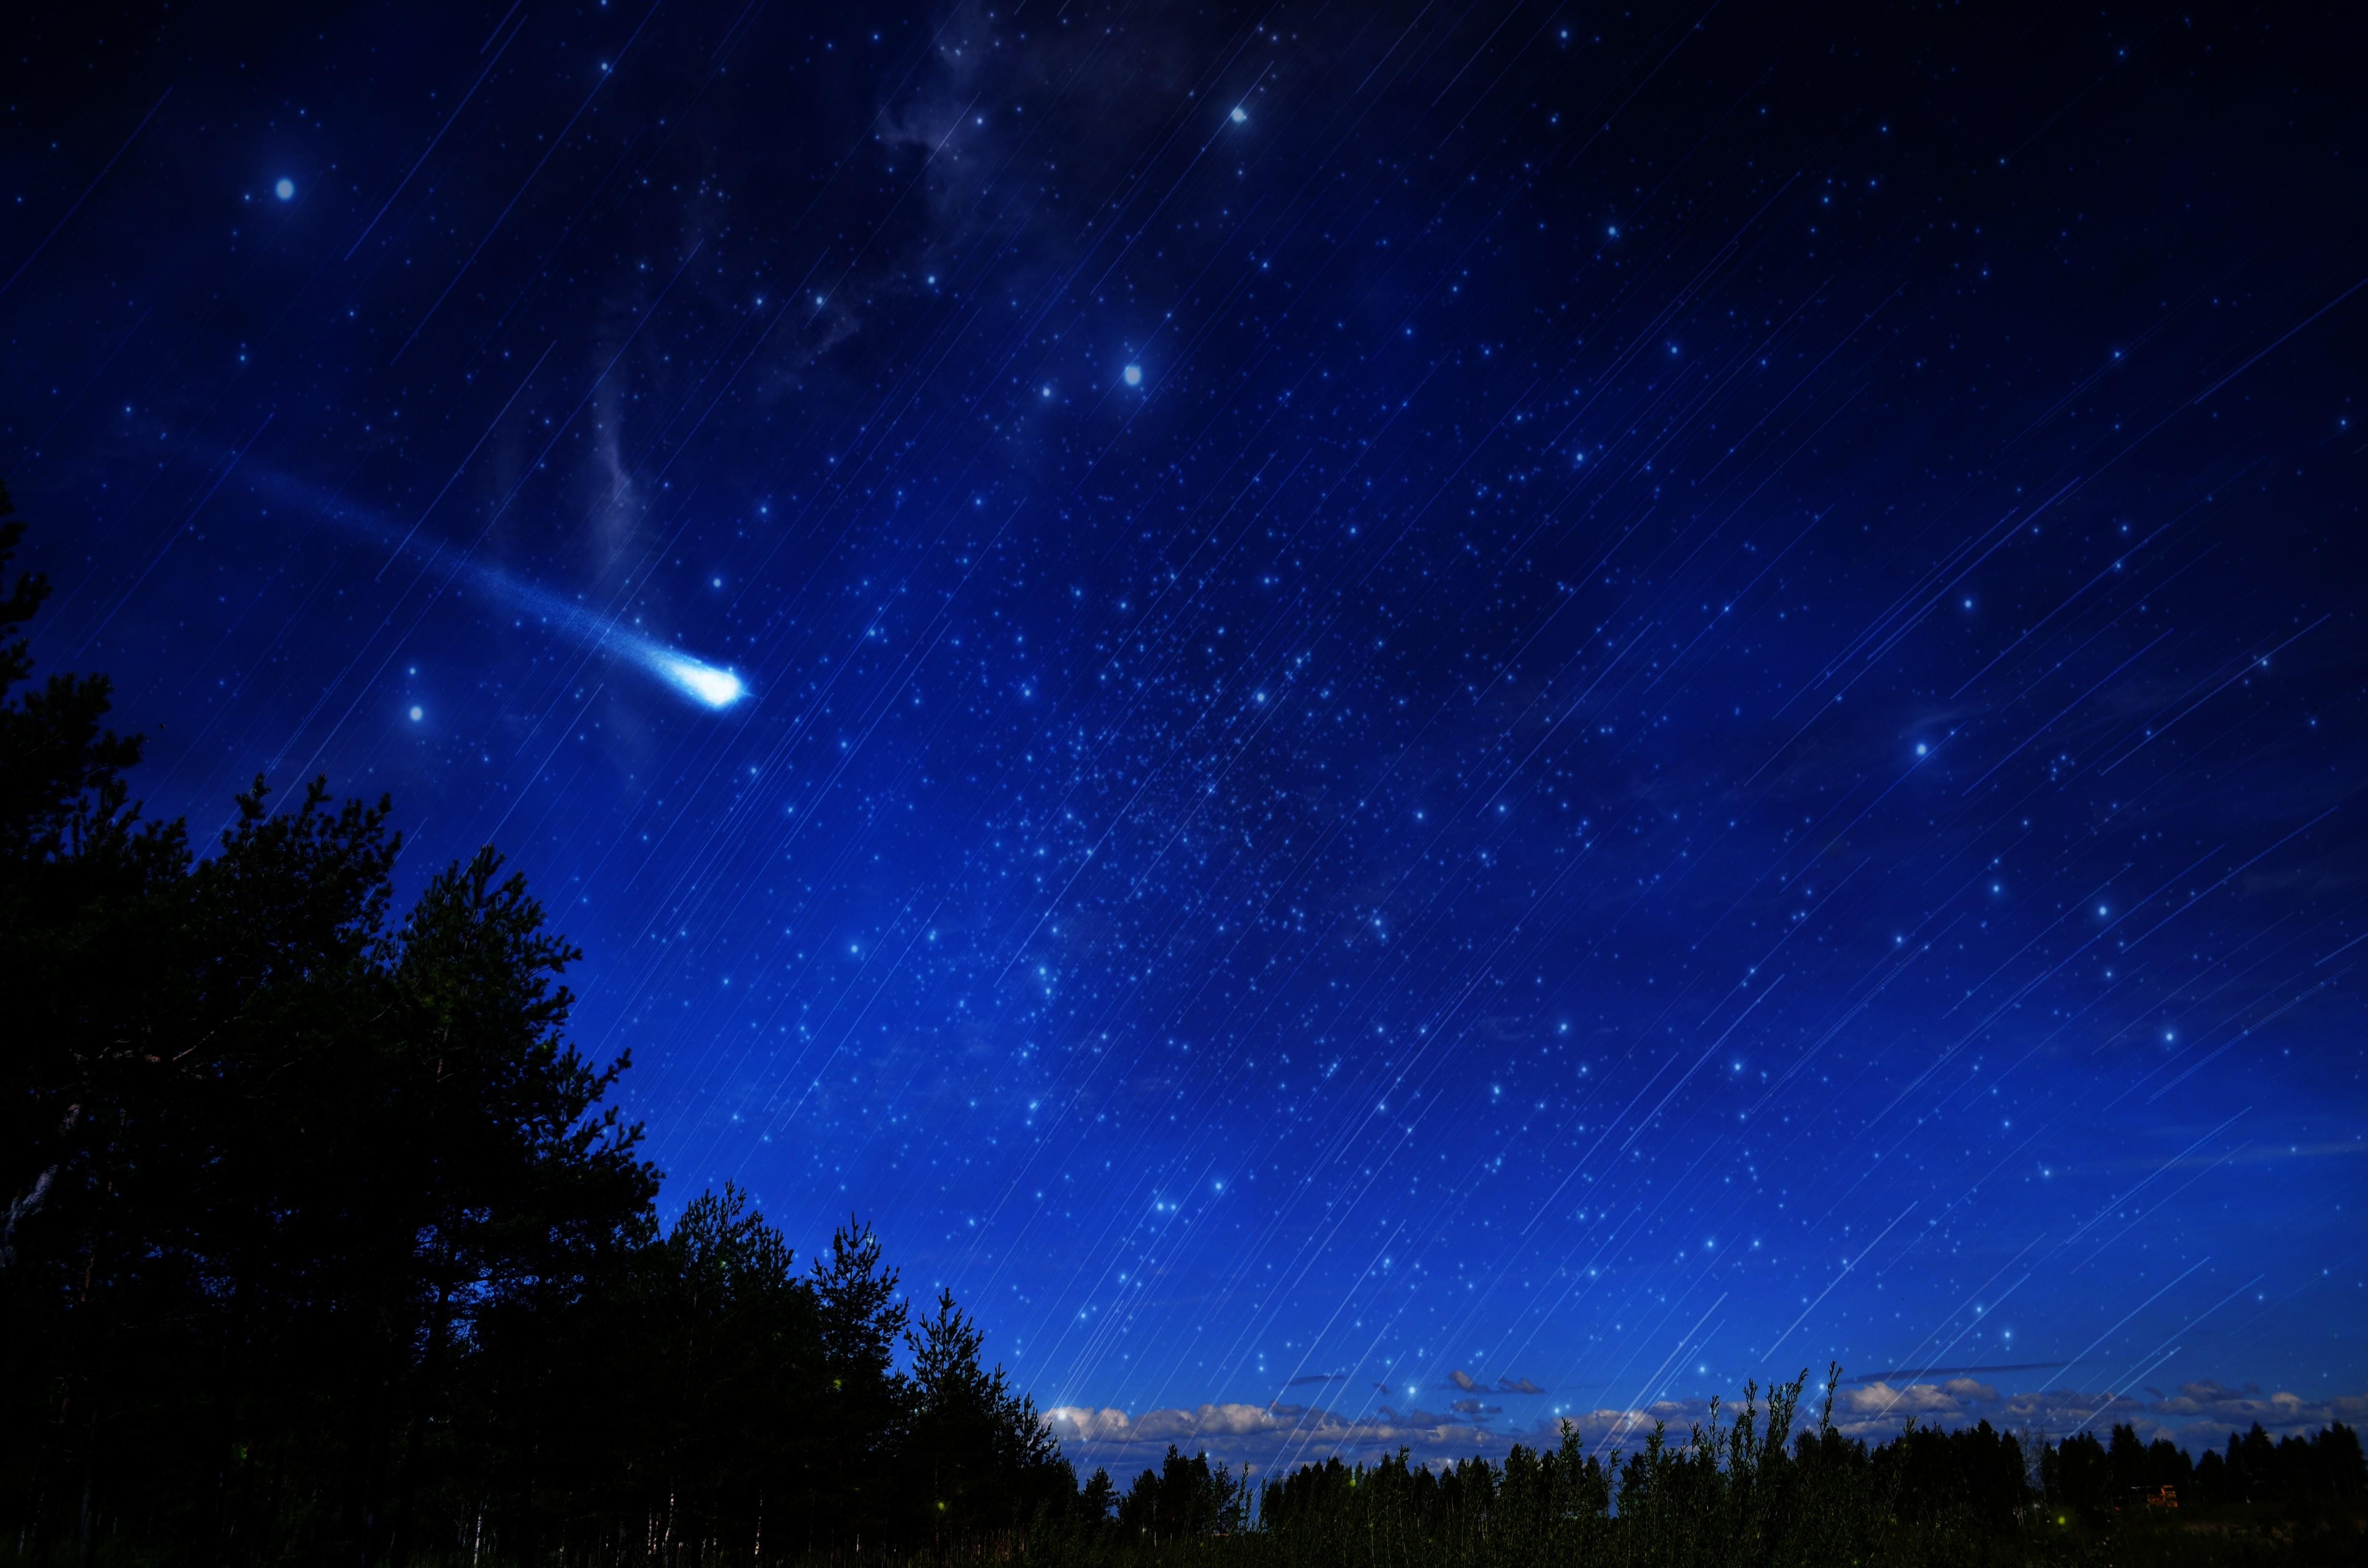 4928x3264 Px Comet Space Stars